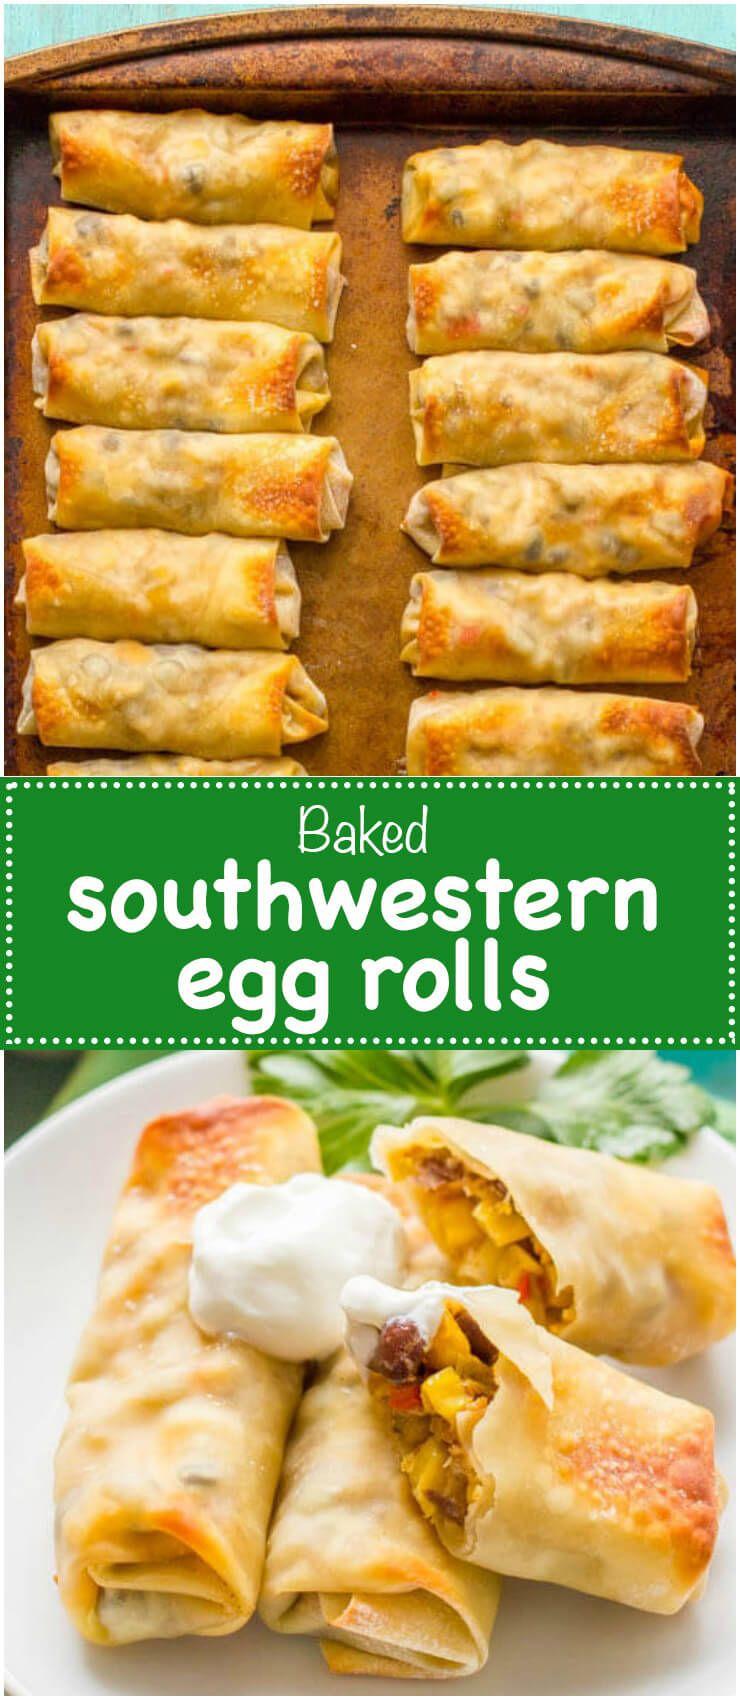 Baked southwestern egg rolls Recipe Food recipes, Food